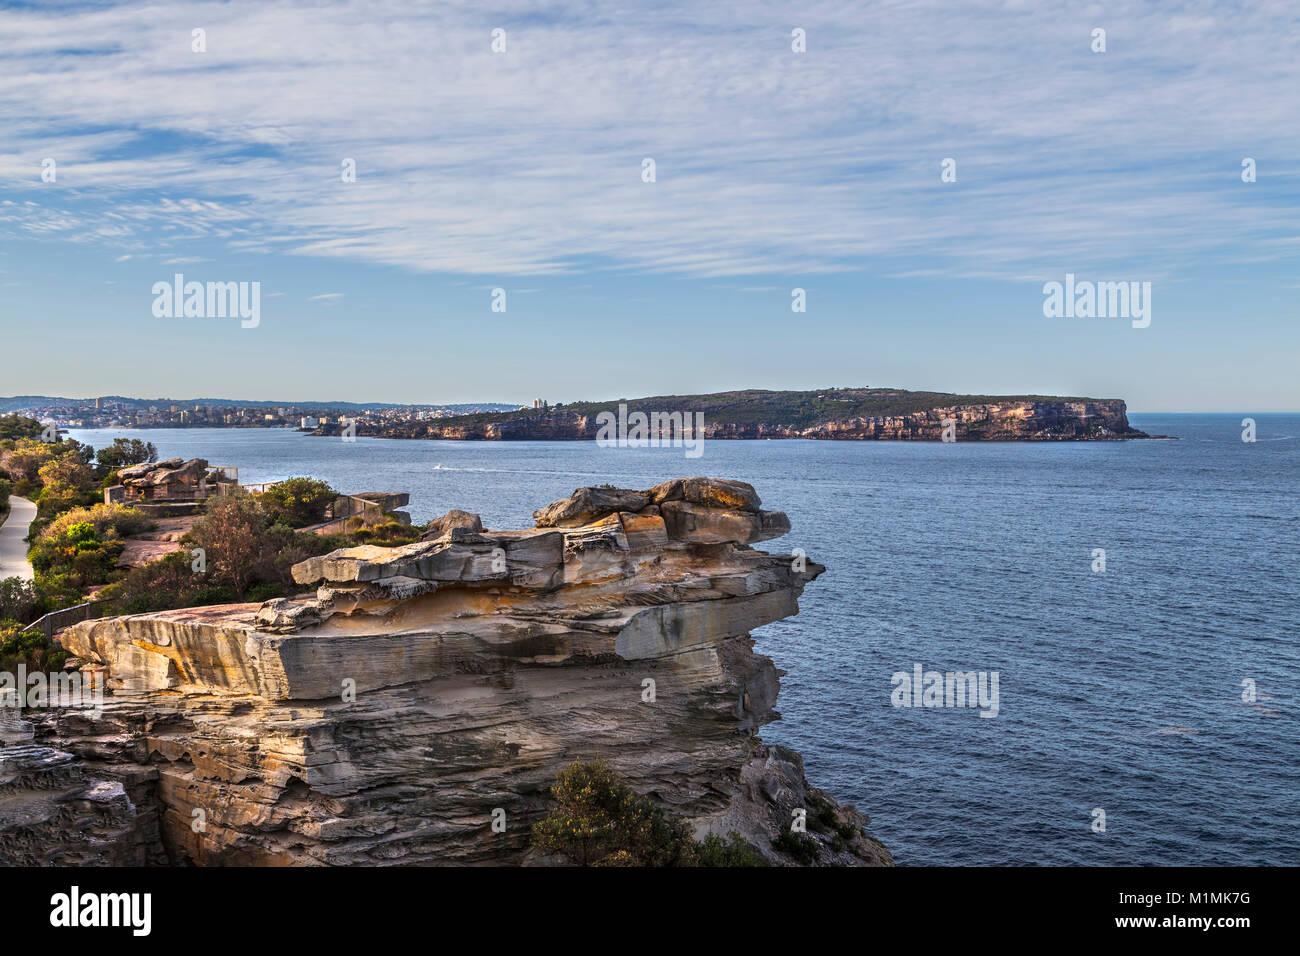 Coastline,Gap Park,Watsons Bay,Sydney,New South Wales,Australia - Stock Image